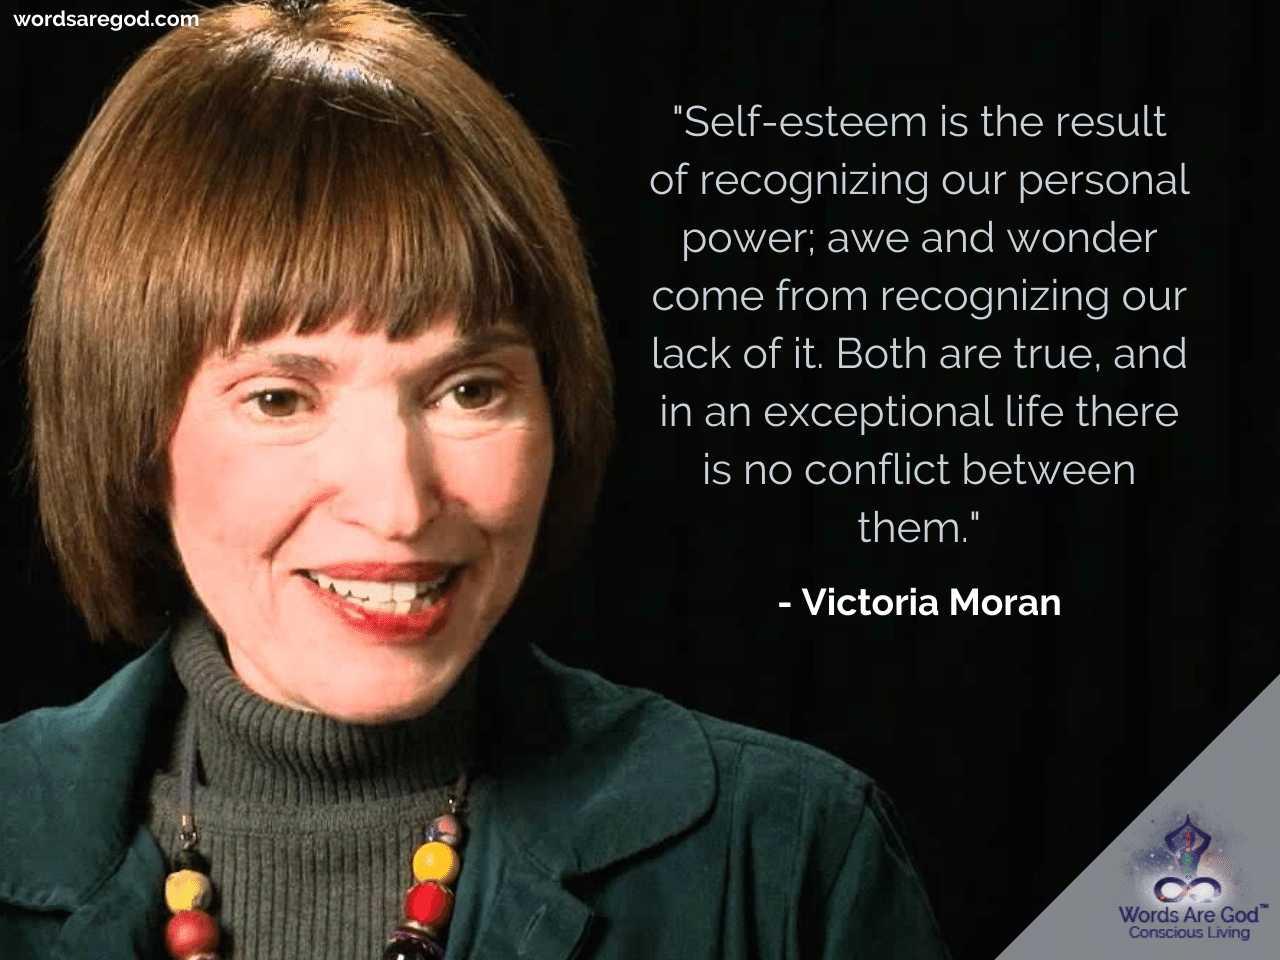 Victoria Moran Motivational Quote